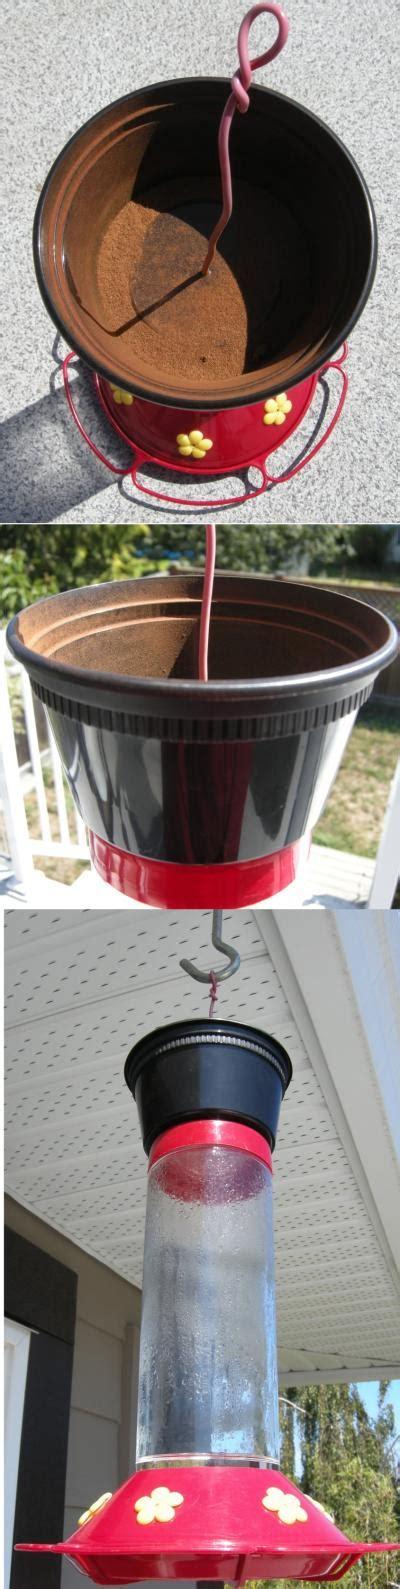 how to keep ants hummingbird feeder keeping ants out of the hummingbird feeder thriftyfun